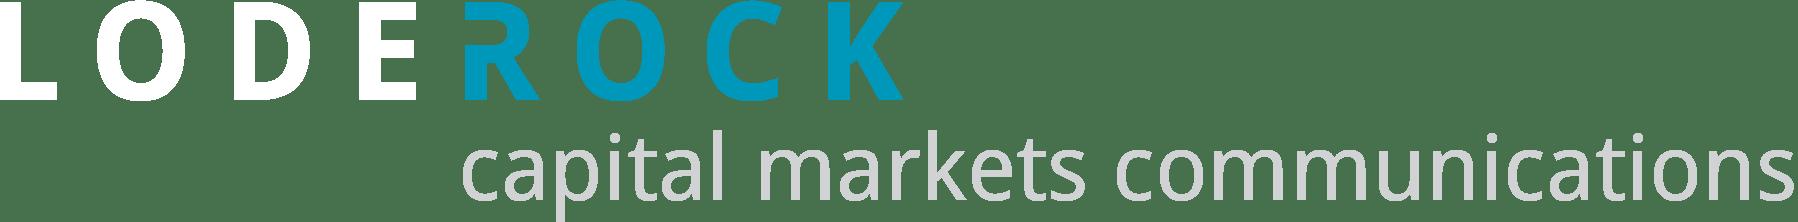 LodeRock capital markets communications